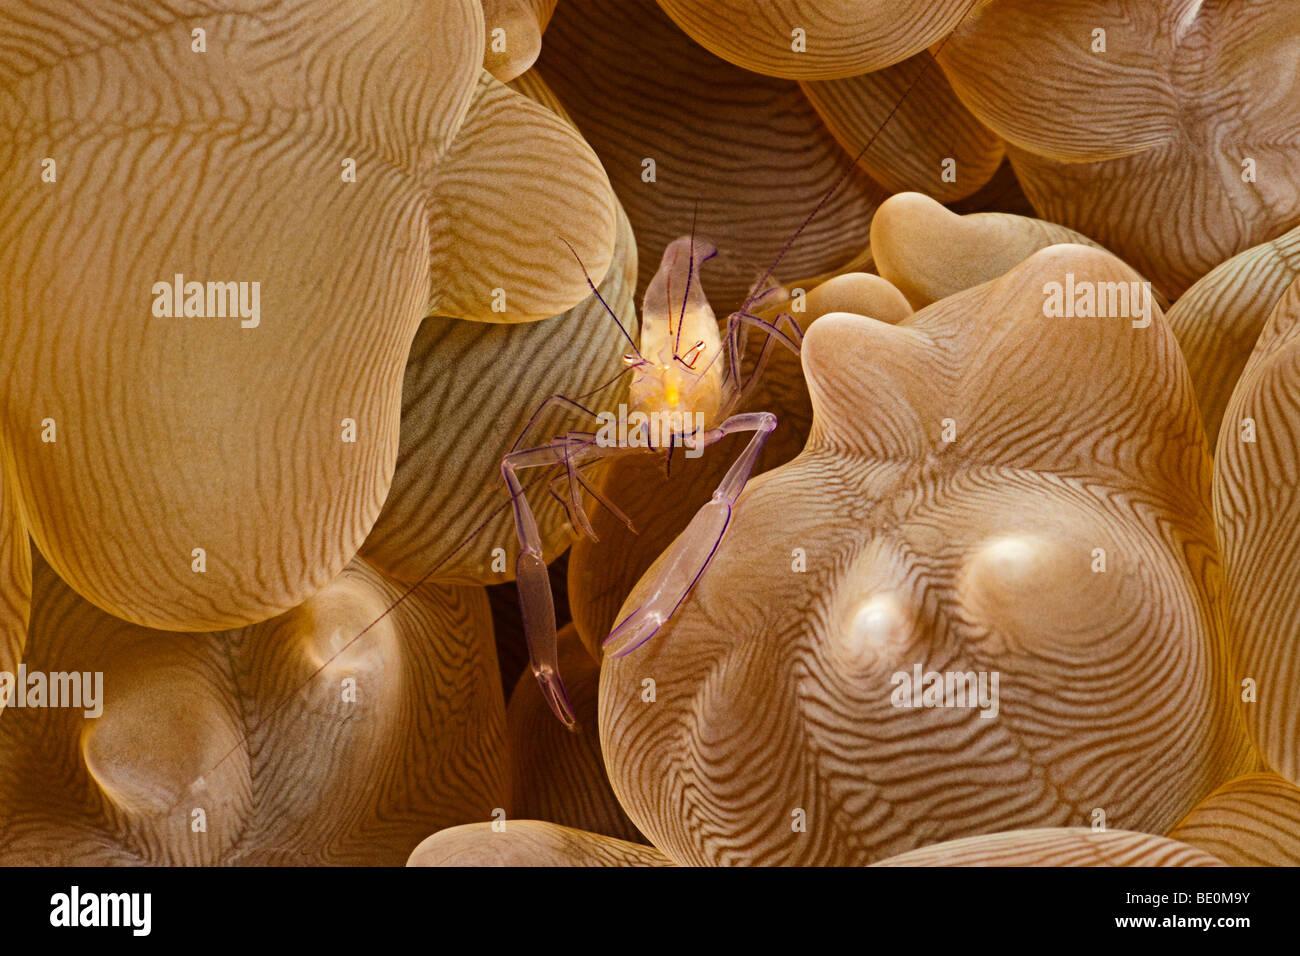 Bolla di gamberi di corallo, Vir philippinensis, sulla bolla di corallo, sp. Filippine. Immagini Stock